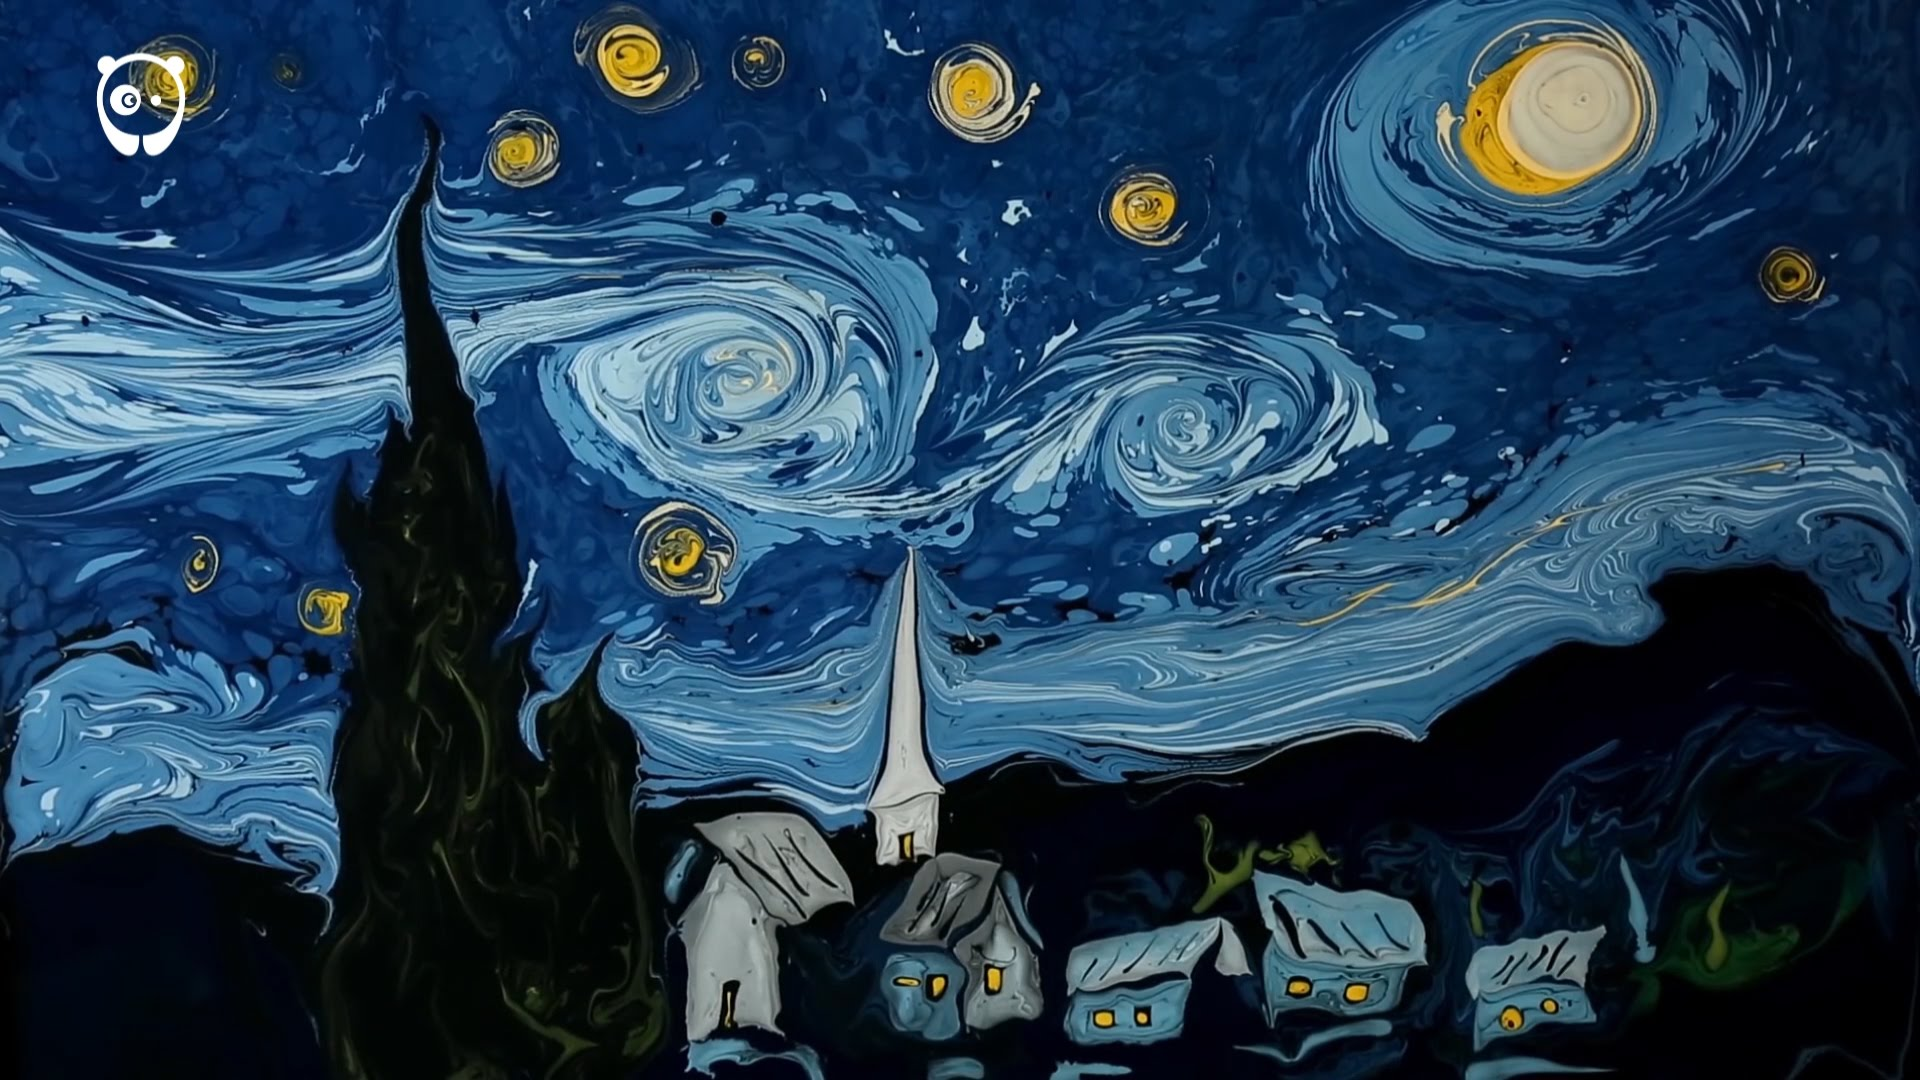 Turkish Artist Creates Increadibly Realistic Van Gogh